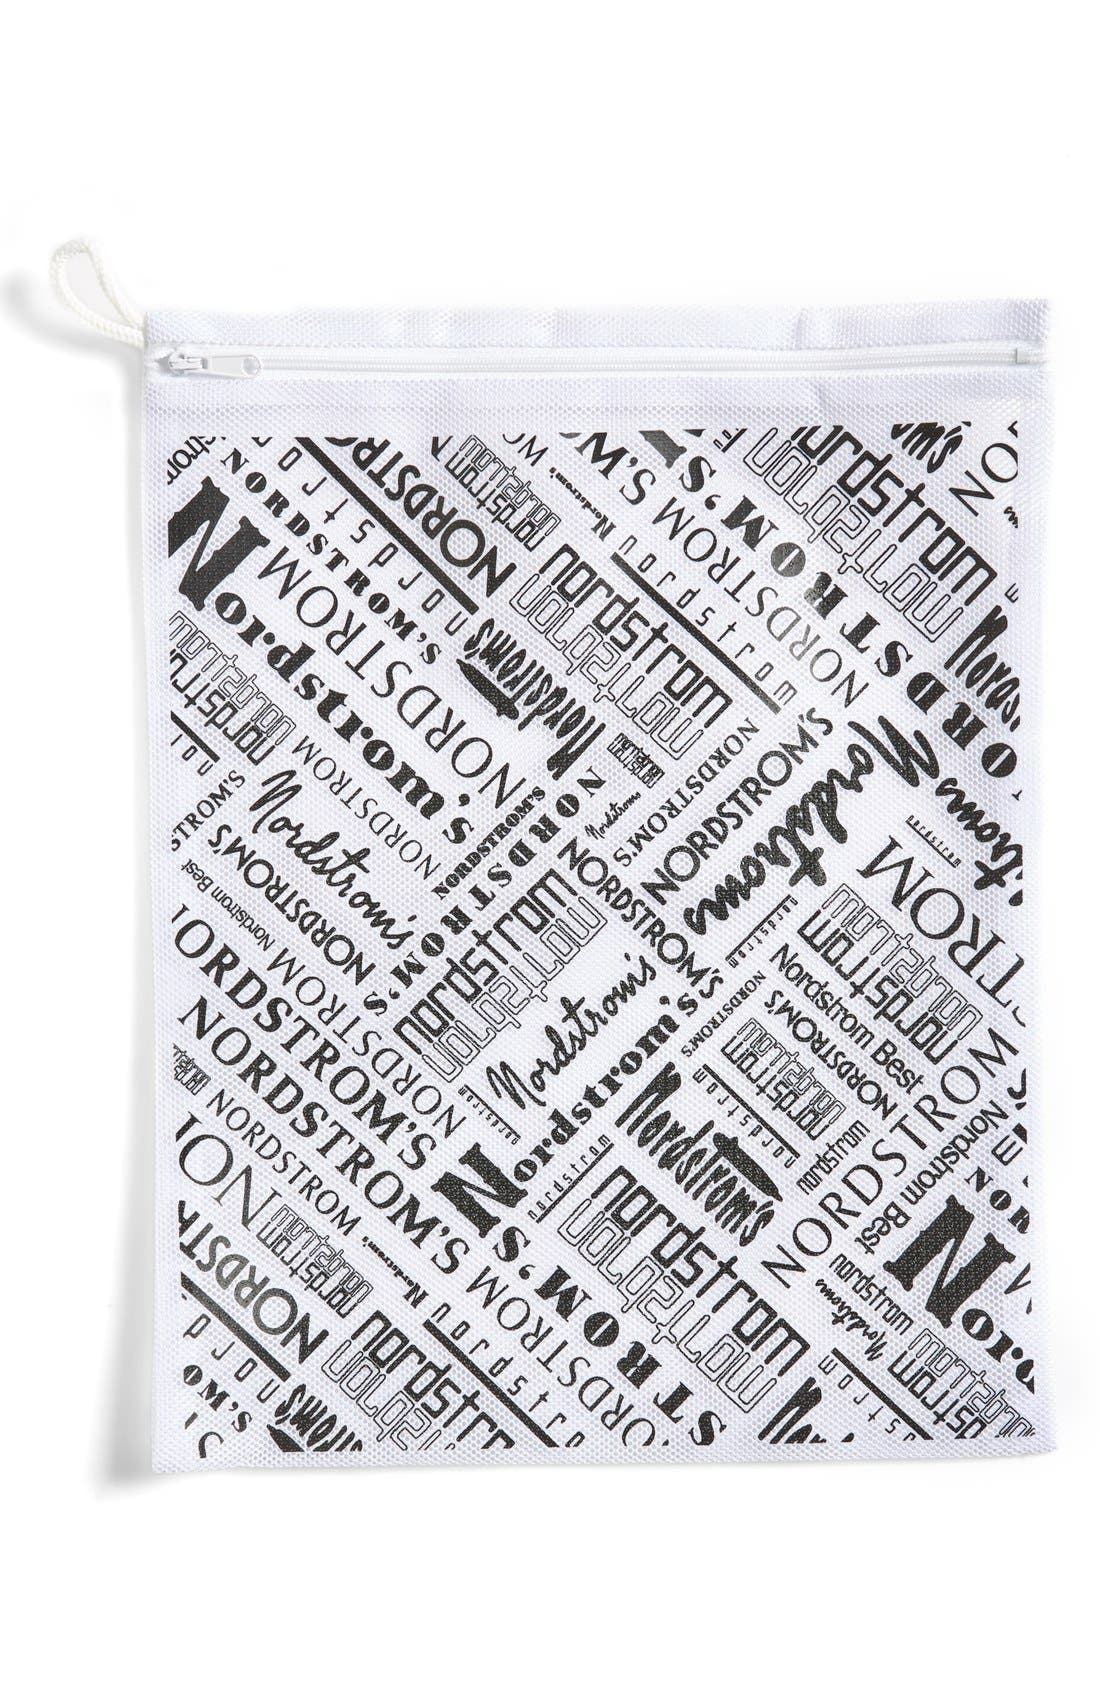 Alternate Image 1 Selected - Nordstrom Intimates Mesh Zip Laundry Wash Bag